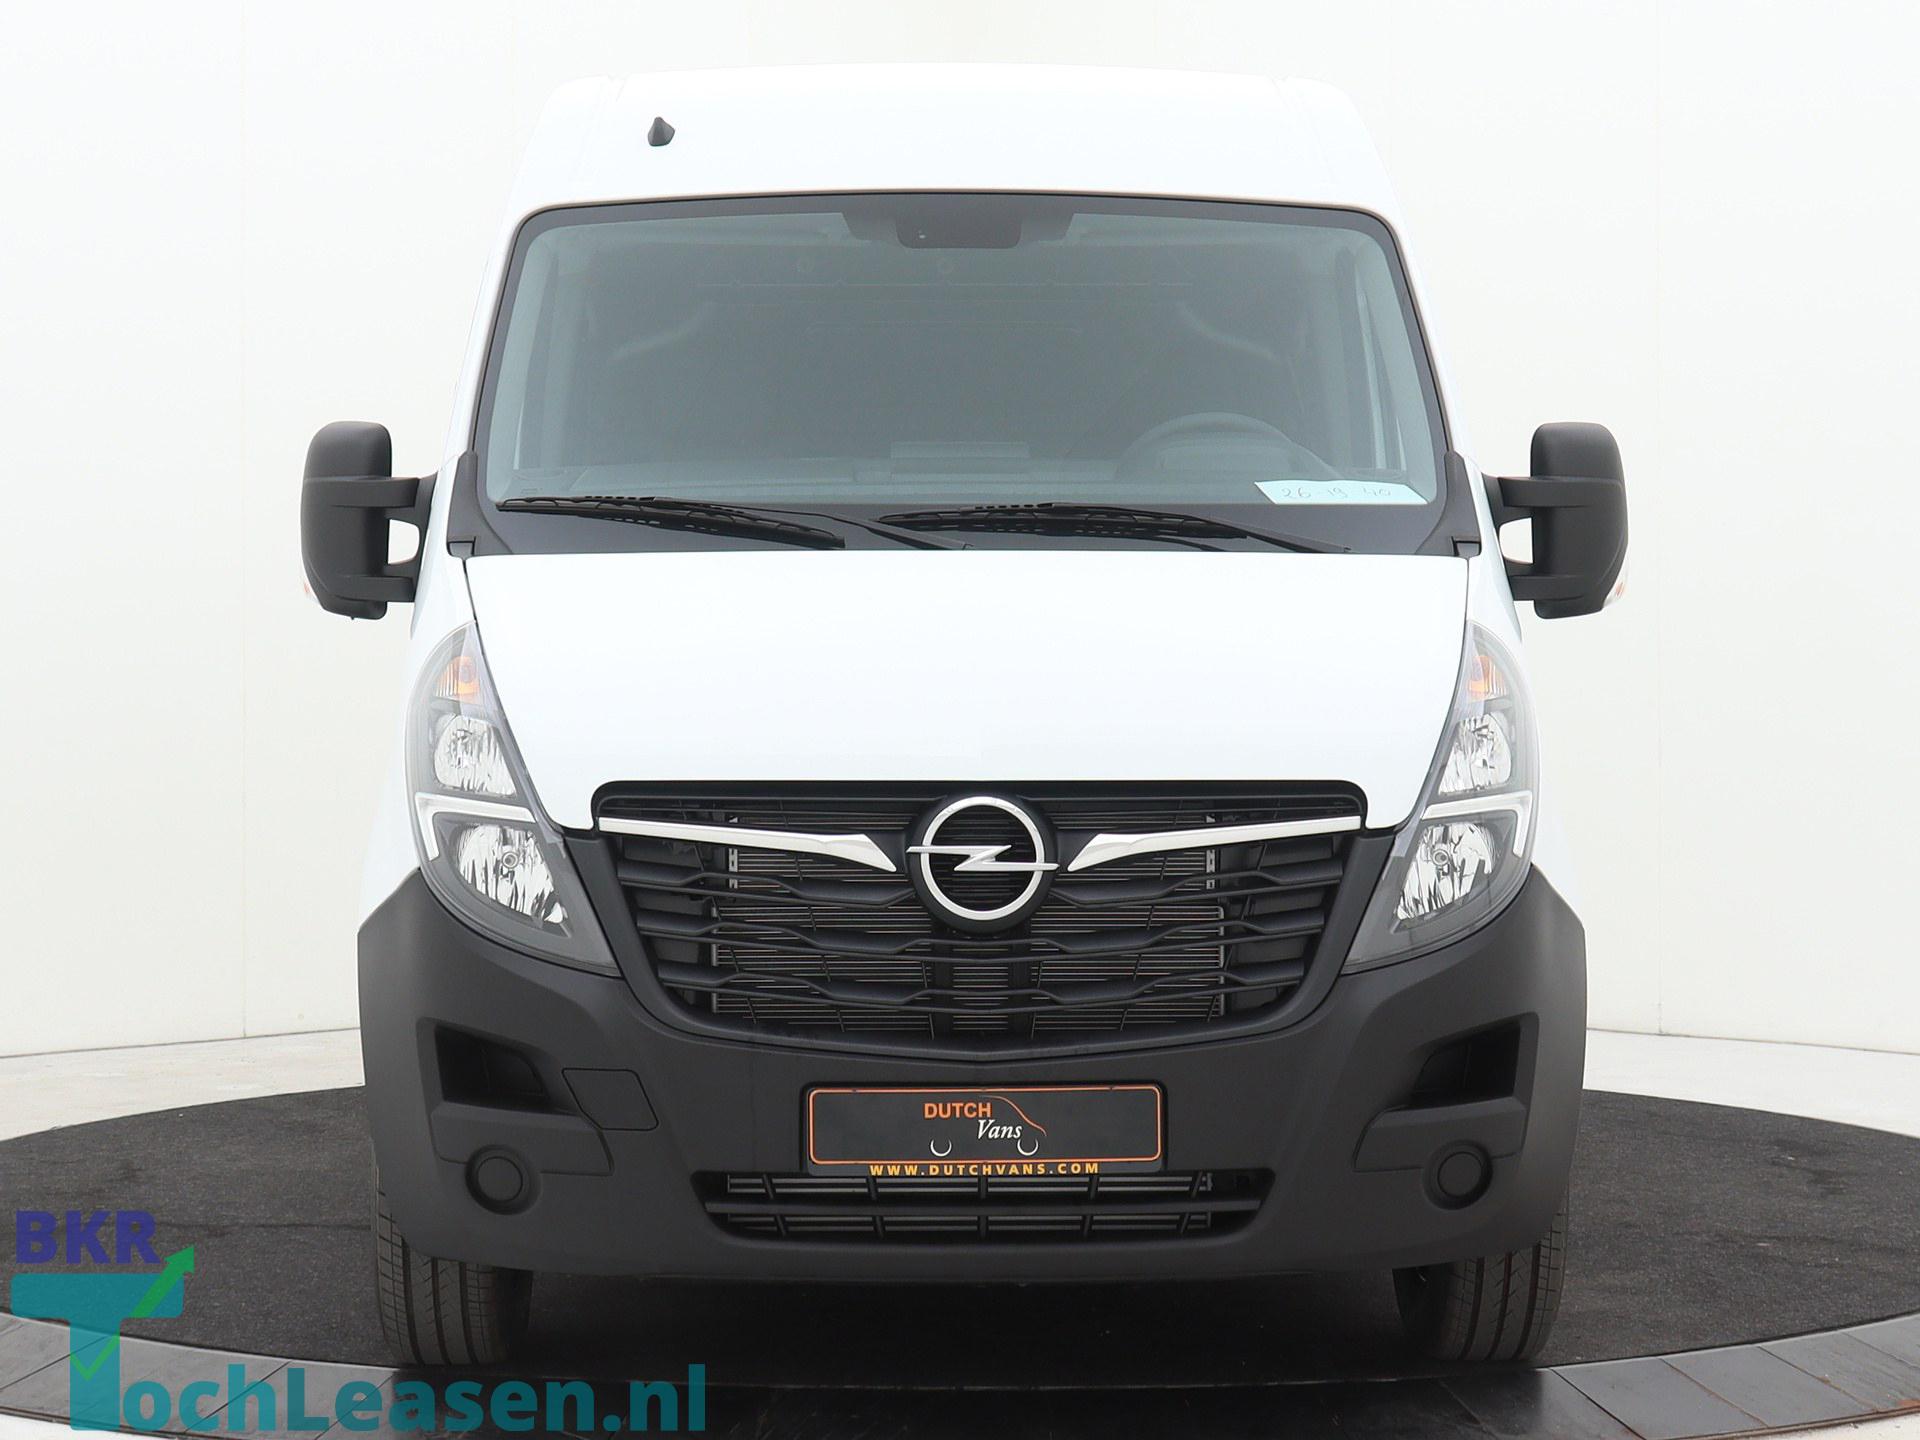 BKRTochLeasen.nl - Opel Movano - L3H2 - wit 05